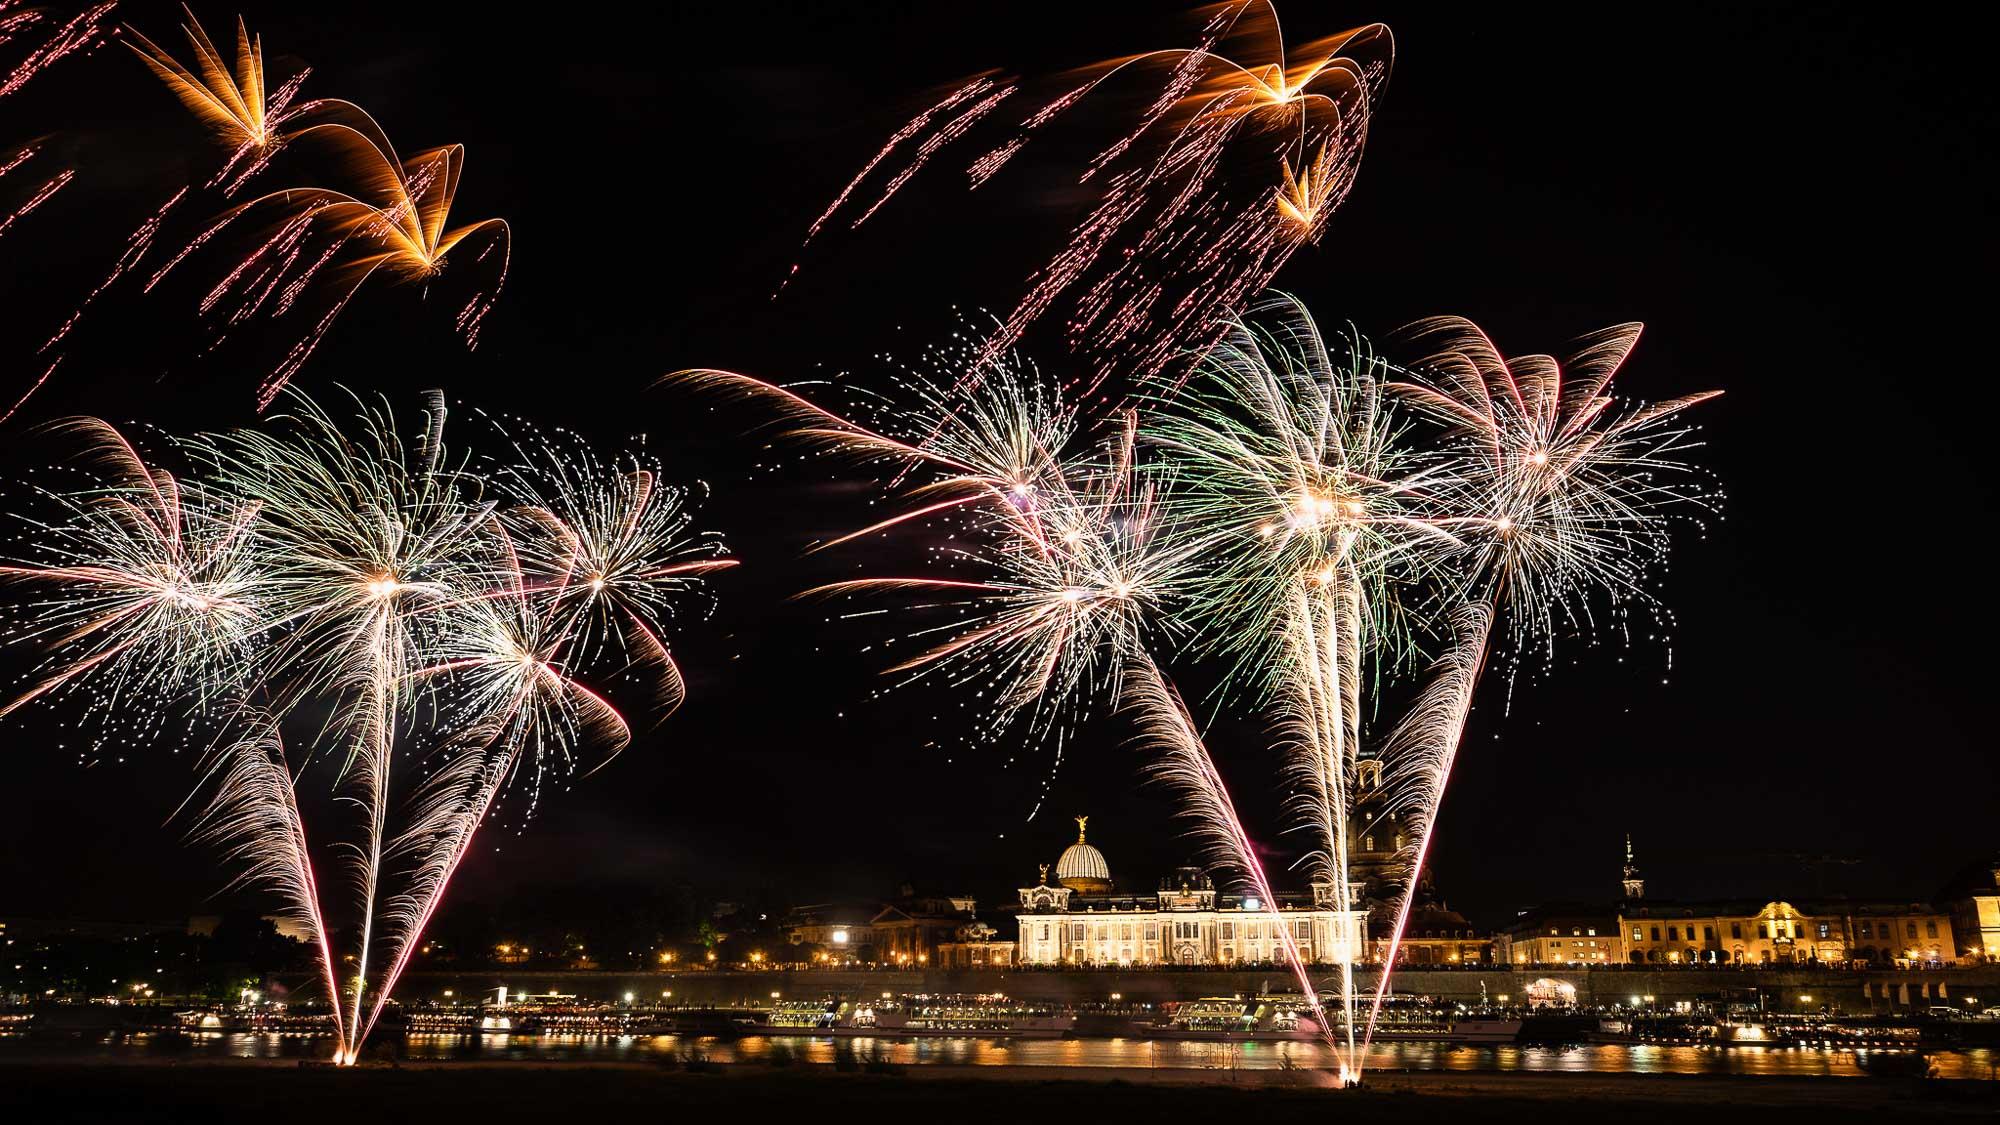 venolab / Feuerwerk